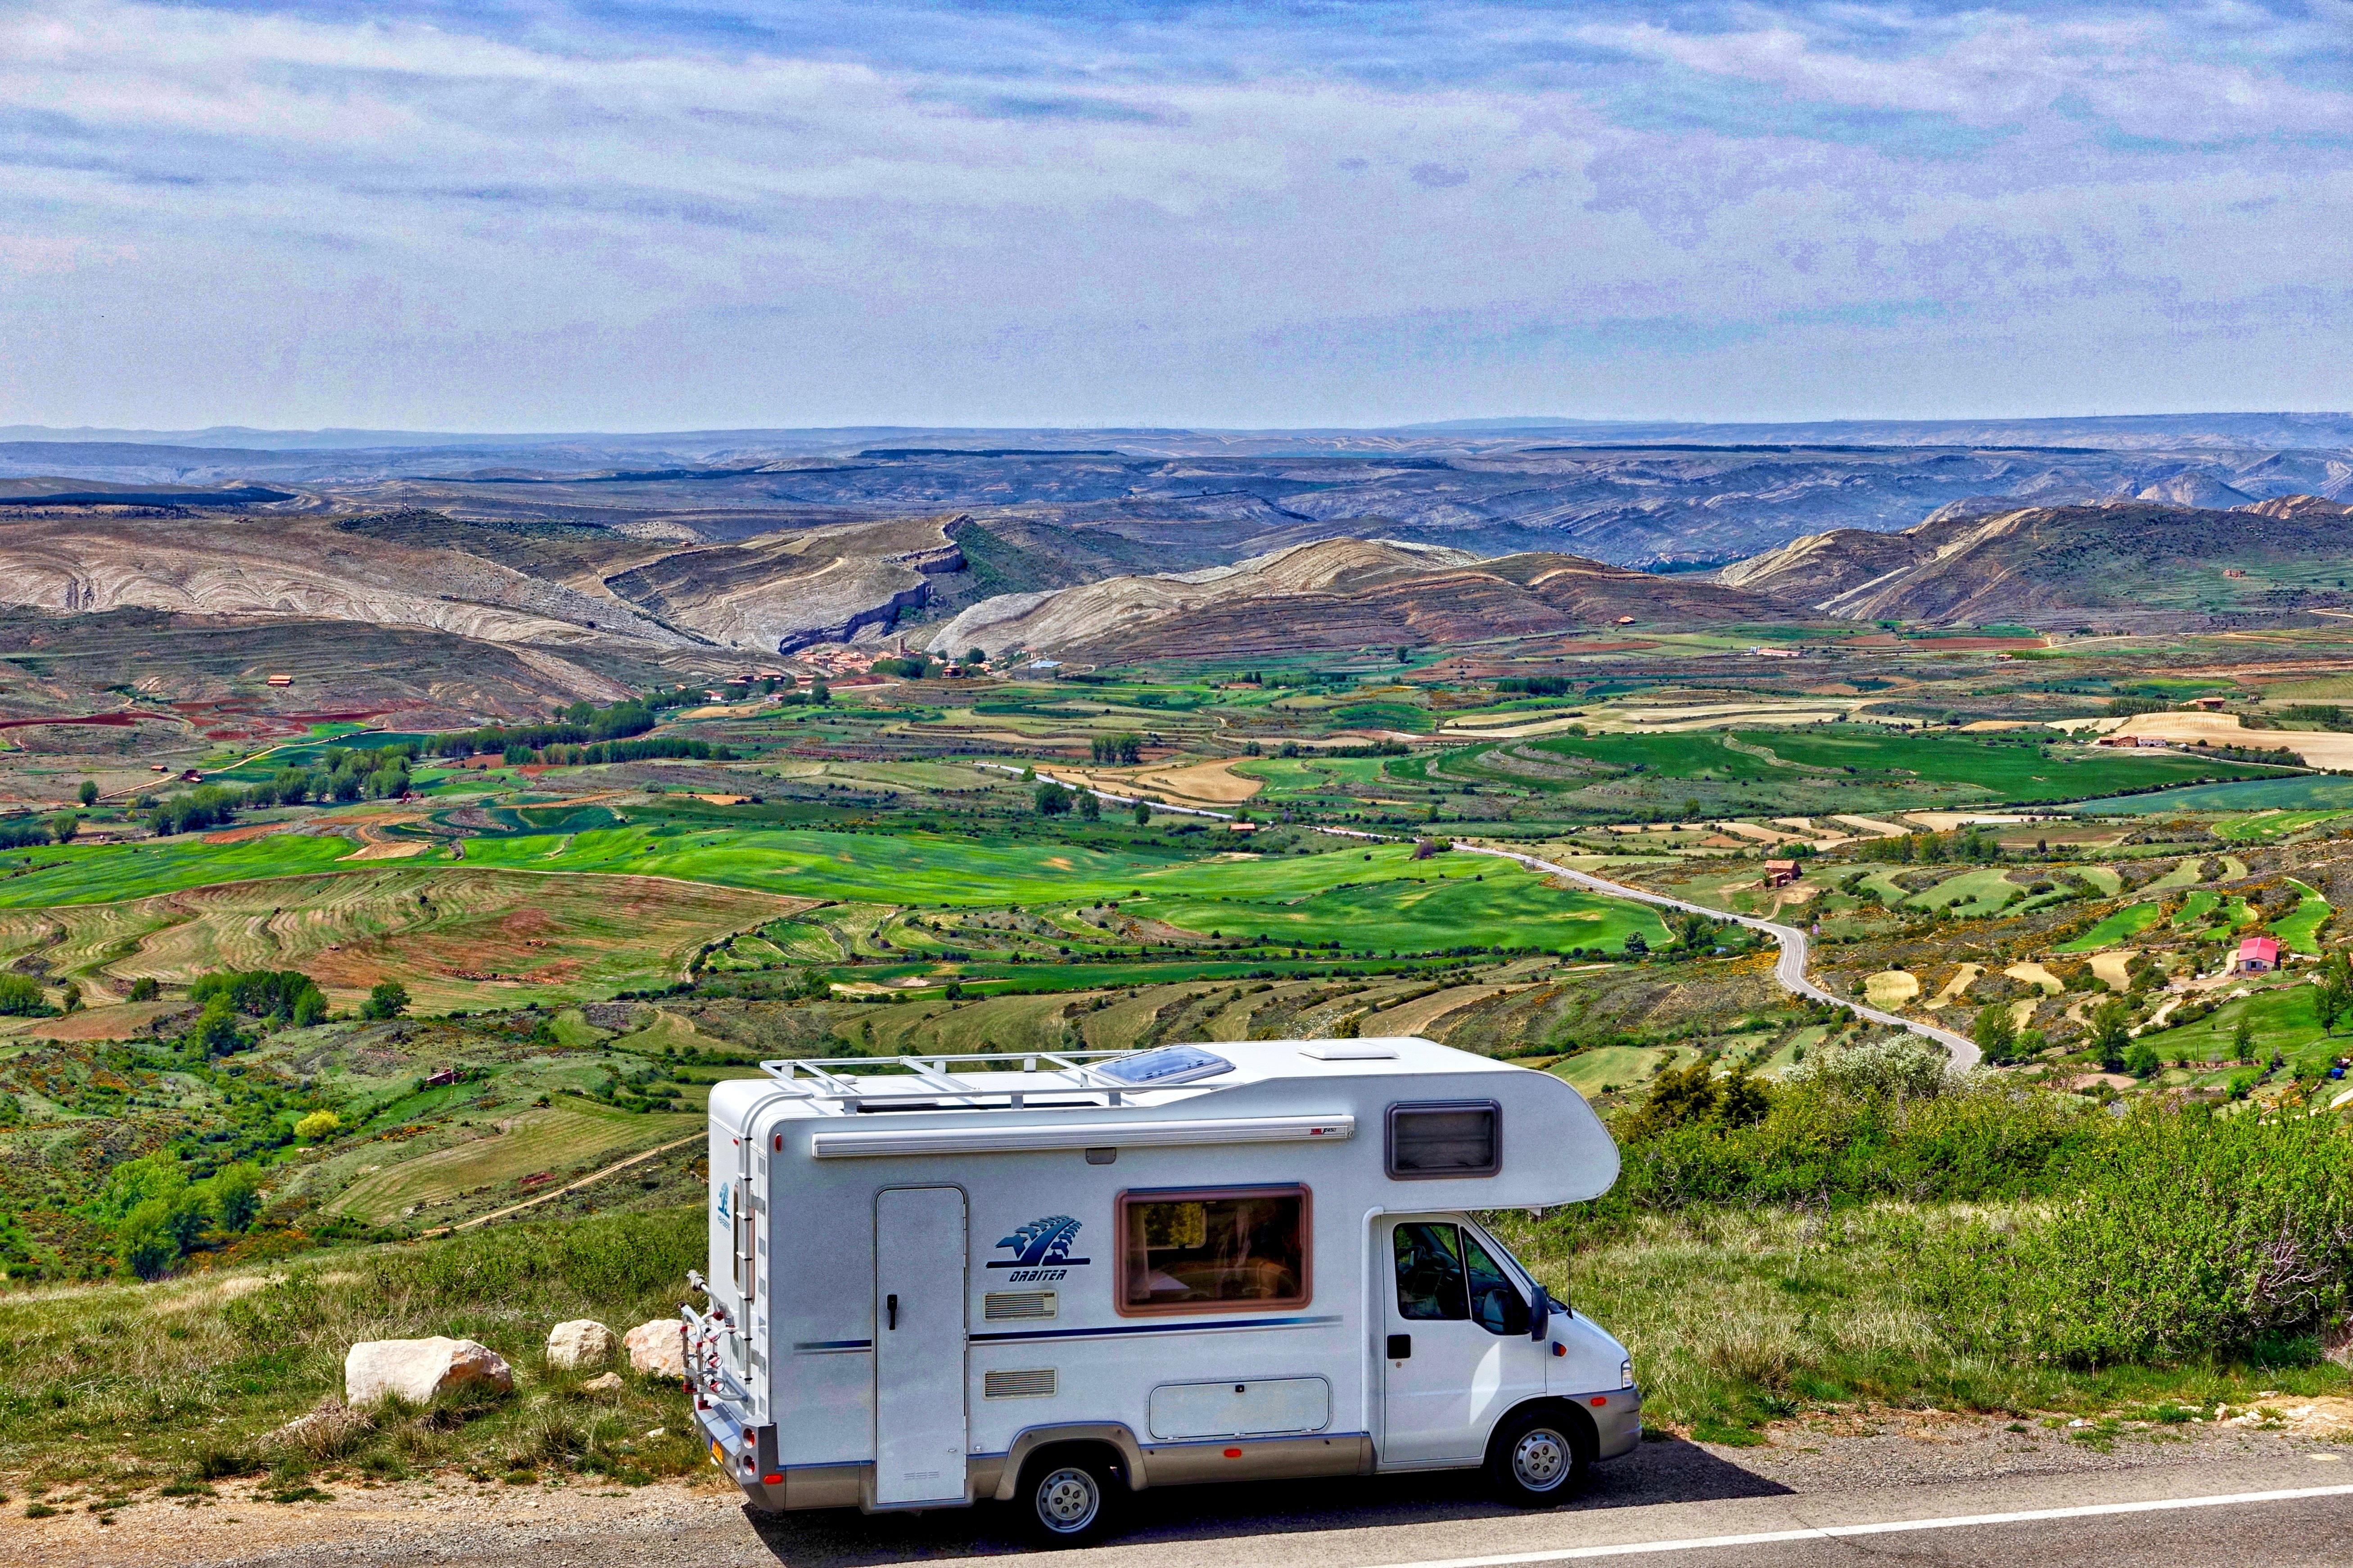 Free Images : landscape, car, highway, mountain range, transport, journey, scenery, holiday ...